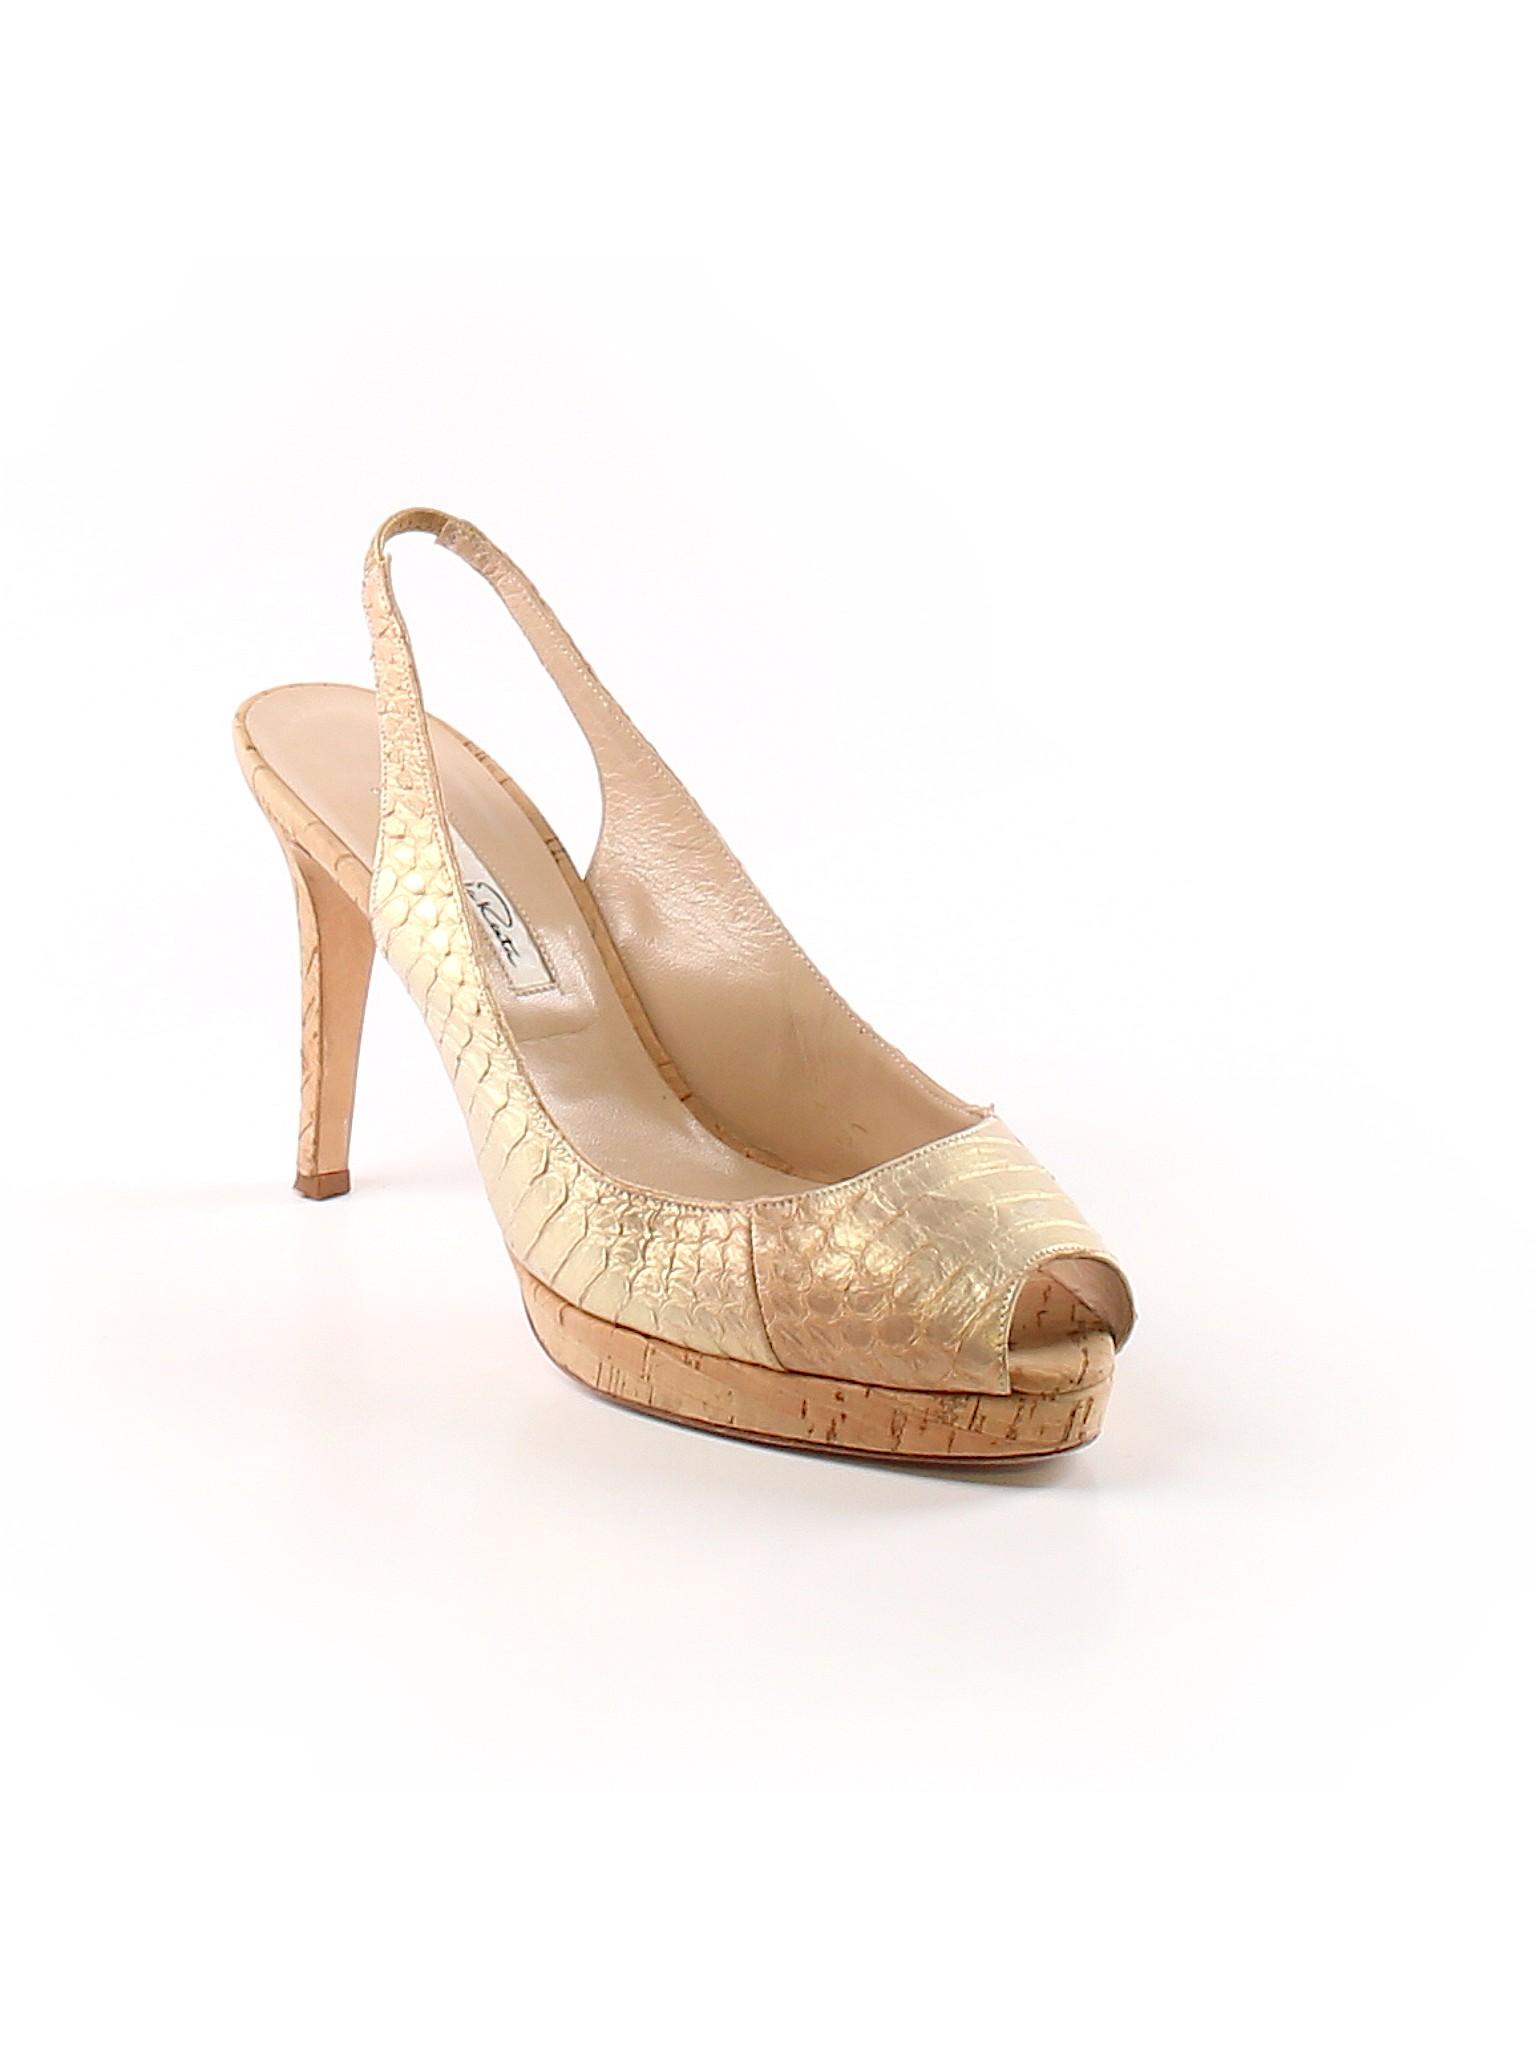 Boutique Oscar promotion De La Heels Renta PPfrq